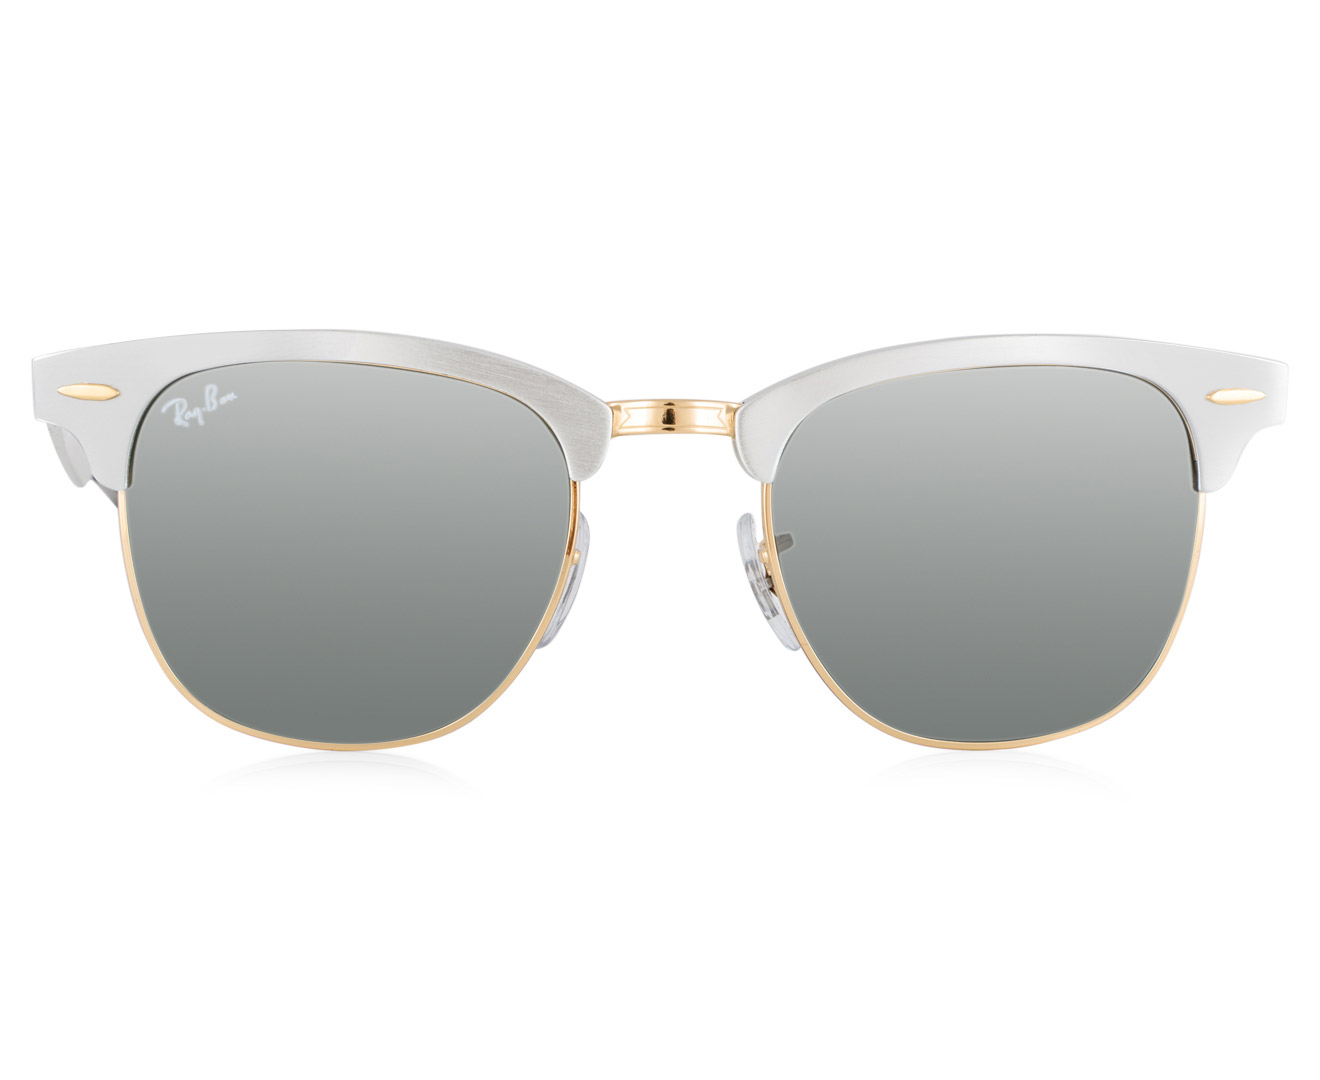 20d59afa43d8 Ray Ban Clubmaster Glasses Ebay